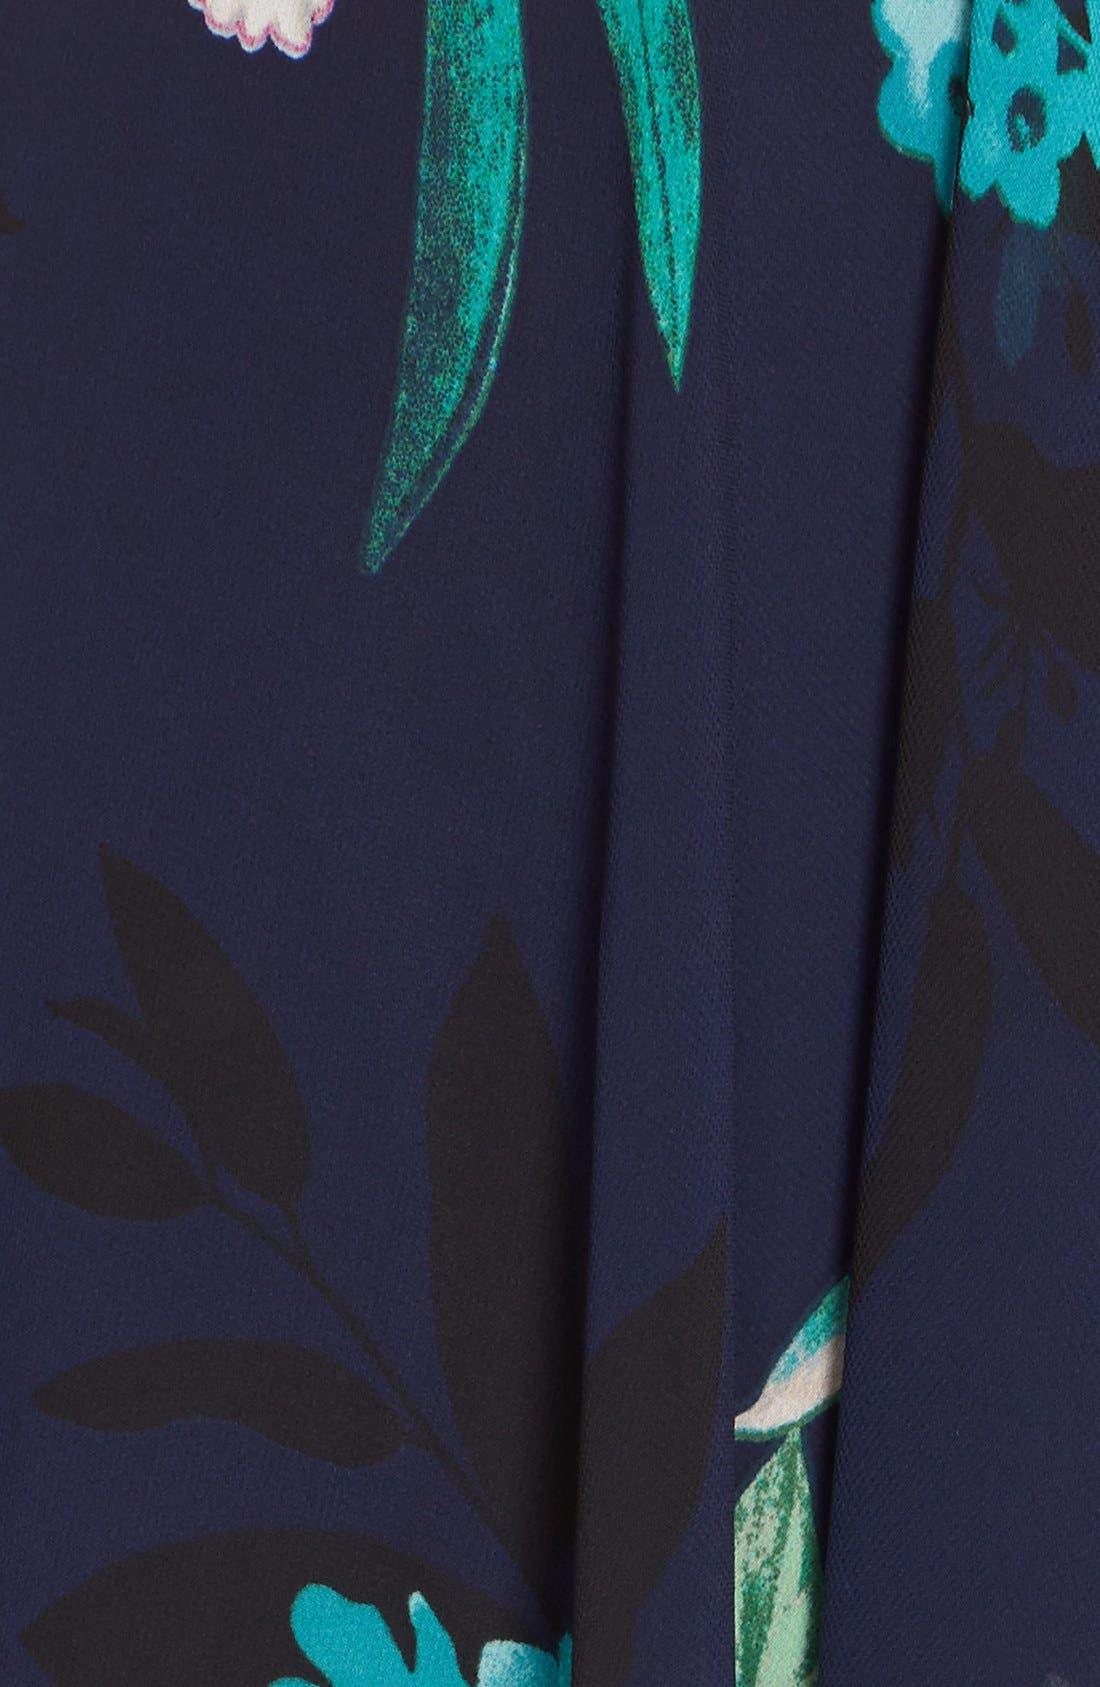 ELIZA J, Floral Print Chiffon High/Low Dress, Alternate thumbnail 2, color, 470